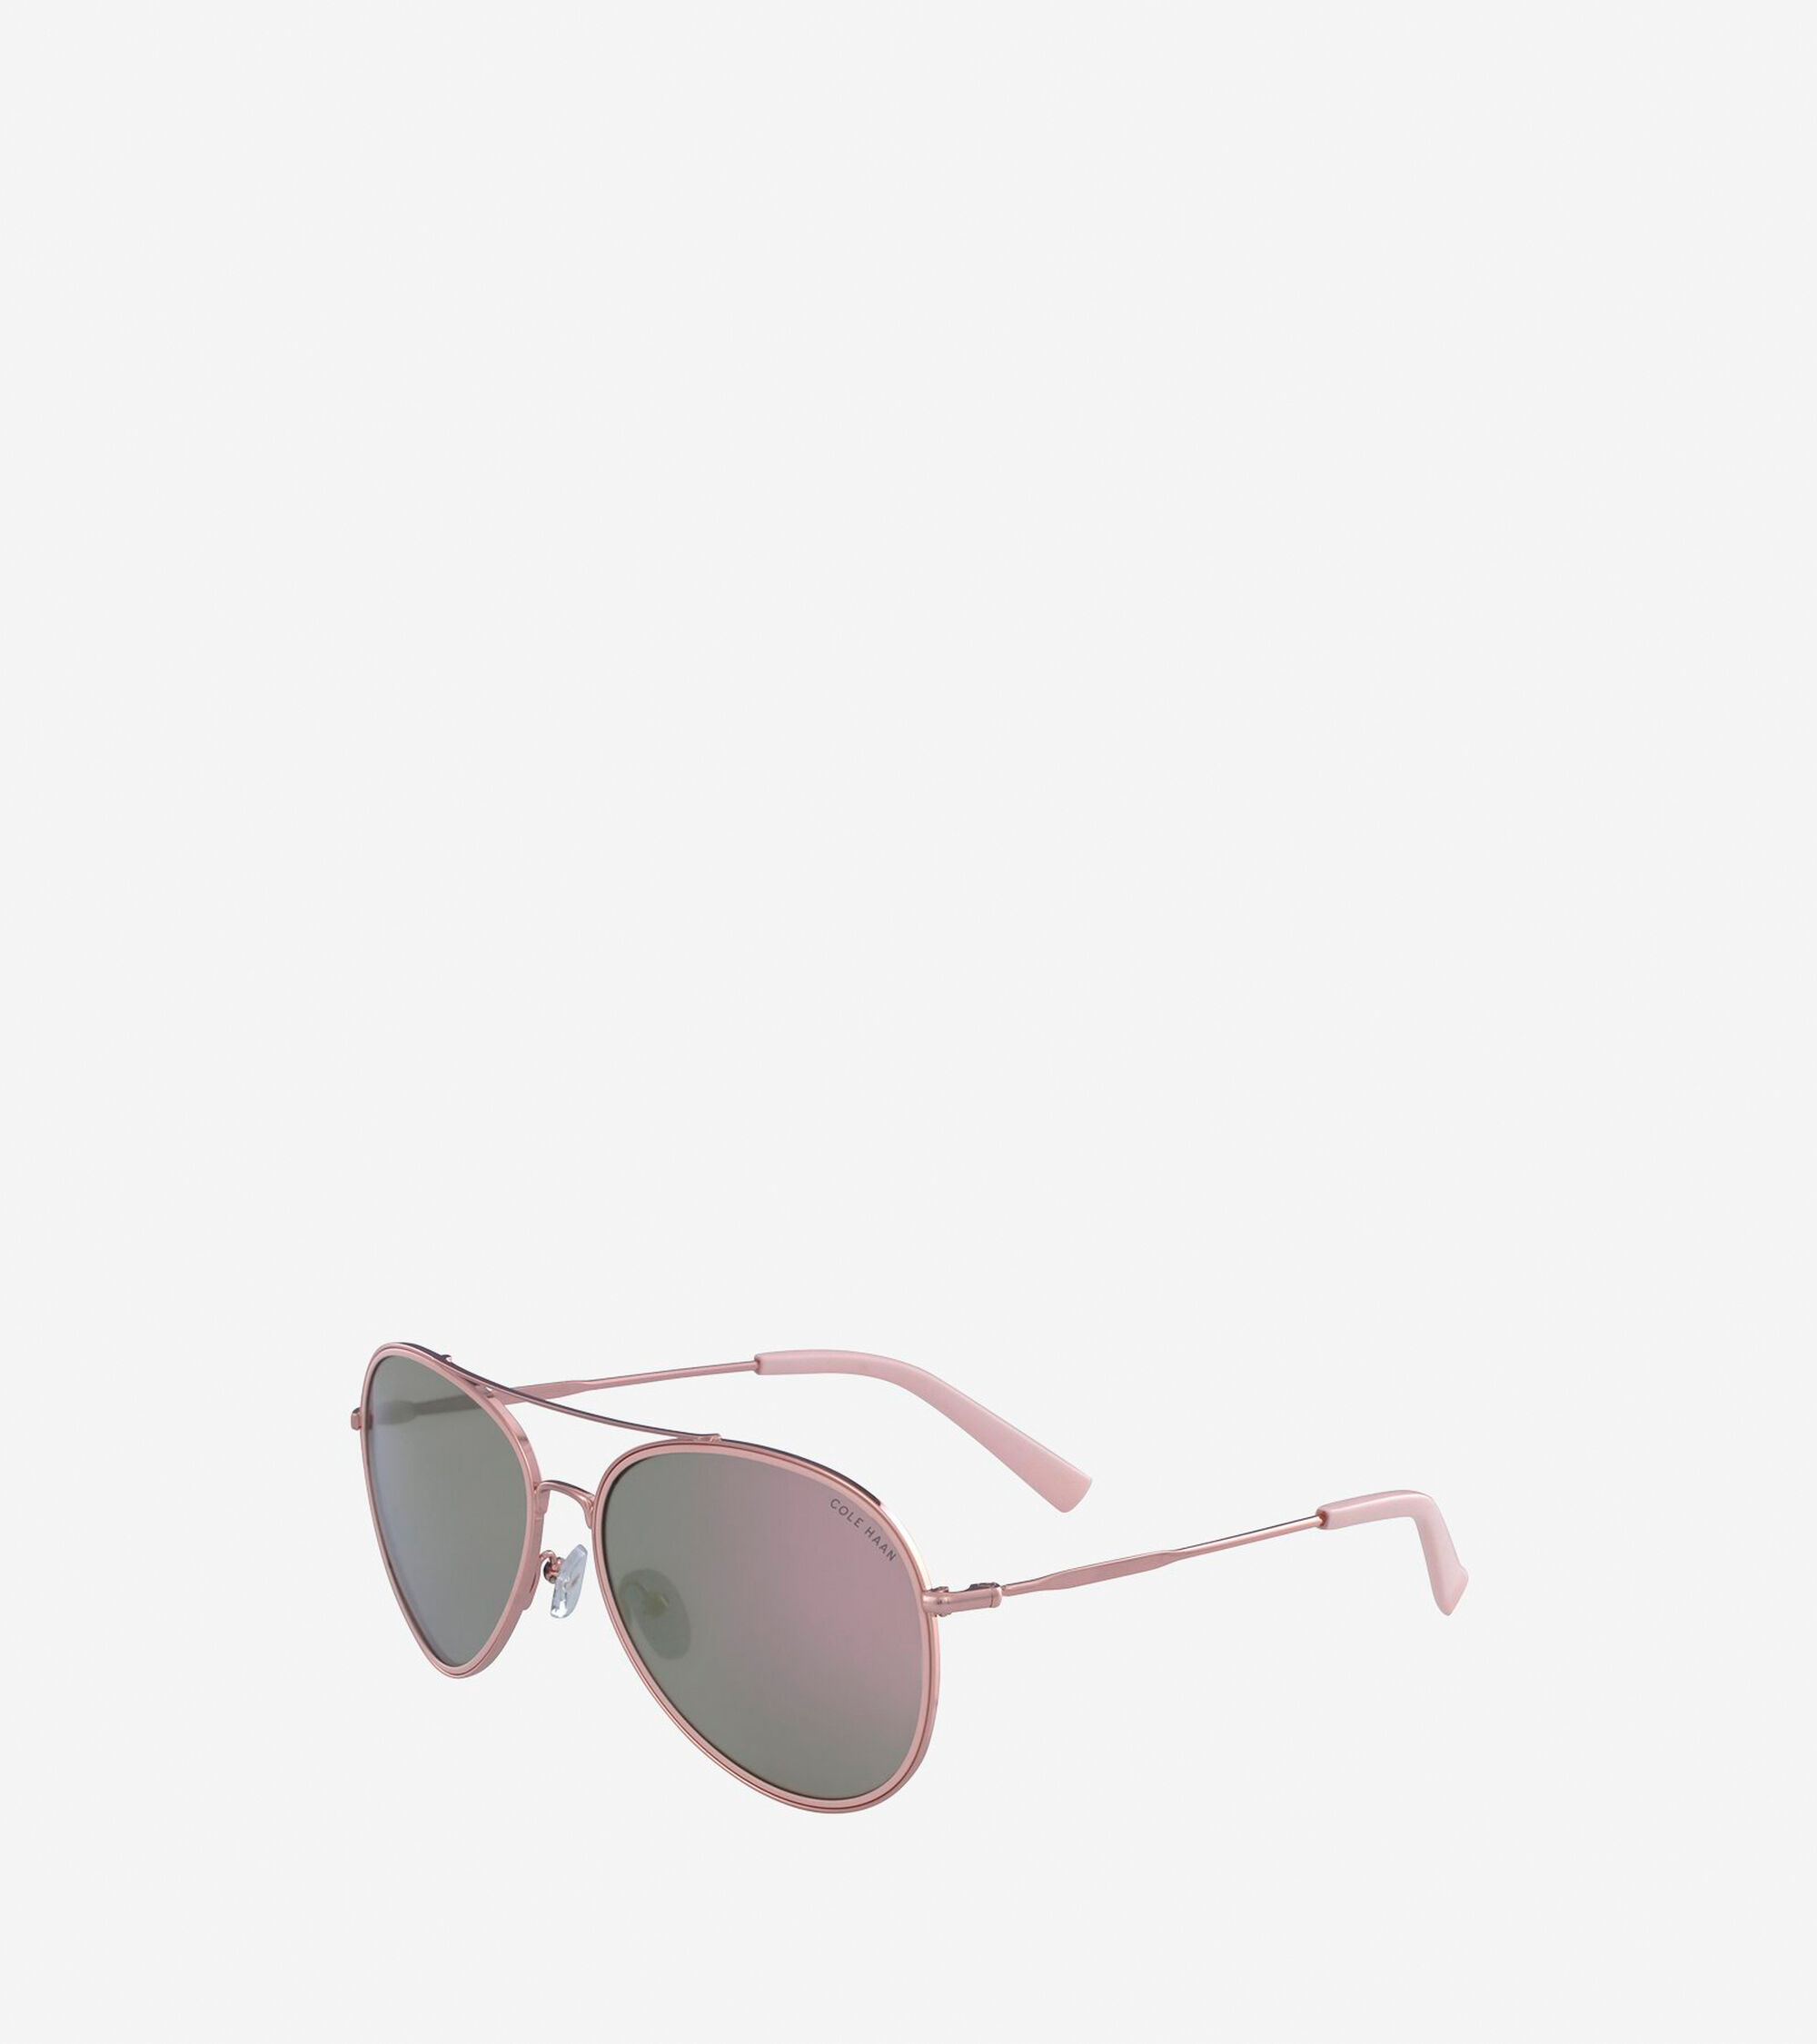 c2ac1791b91 Grand Aviator Sunglasses · Grand Aviator Sunglasses · Grand Aviator  Sunglasses